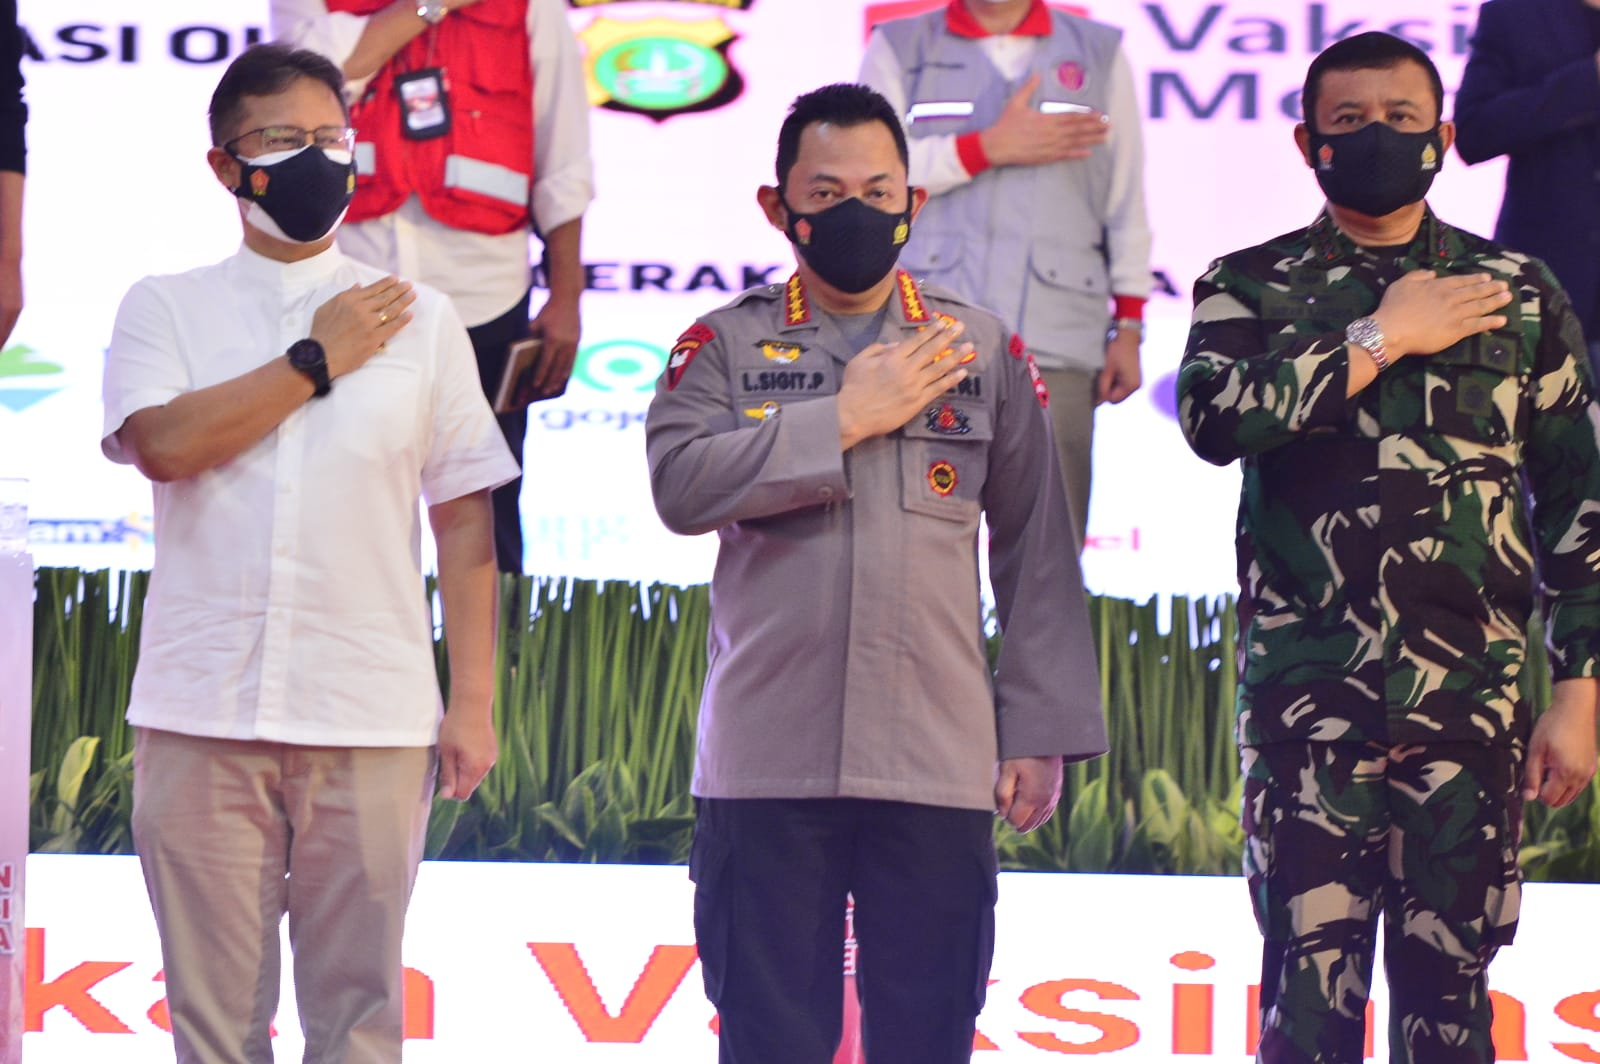 Kapolri Jenderal Pol Listyo Sigit Prabowo dan jajarannya beserta seluruh stakeholder melaouncing Vaksinasi Merdeka. (Foto: PMJ News)lein